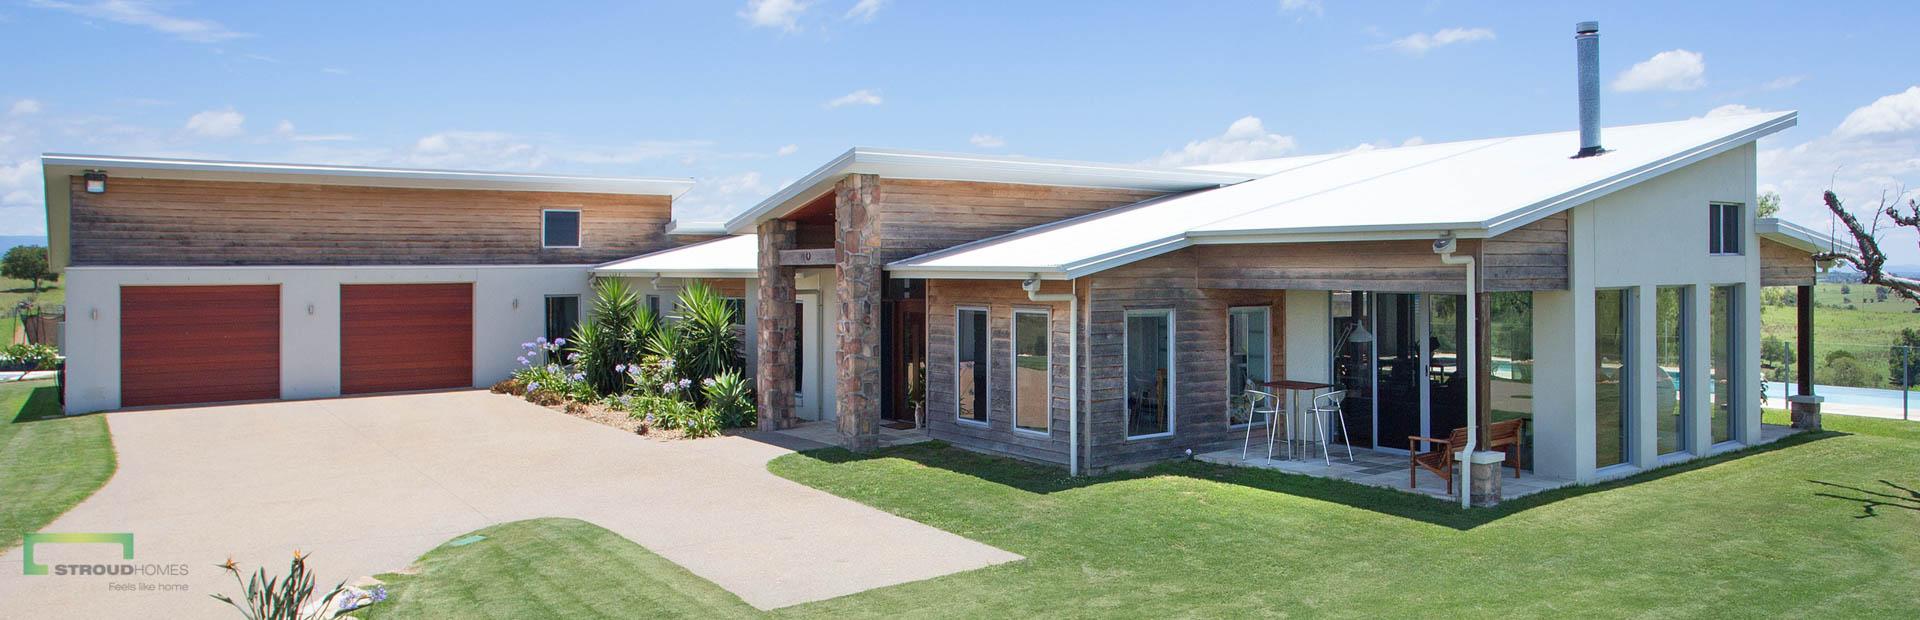 Acreage Home Designs. Esperance Acreage Home Design By Mcdonald ...